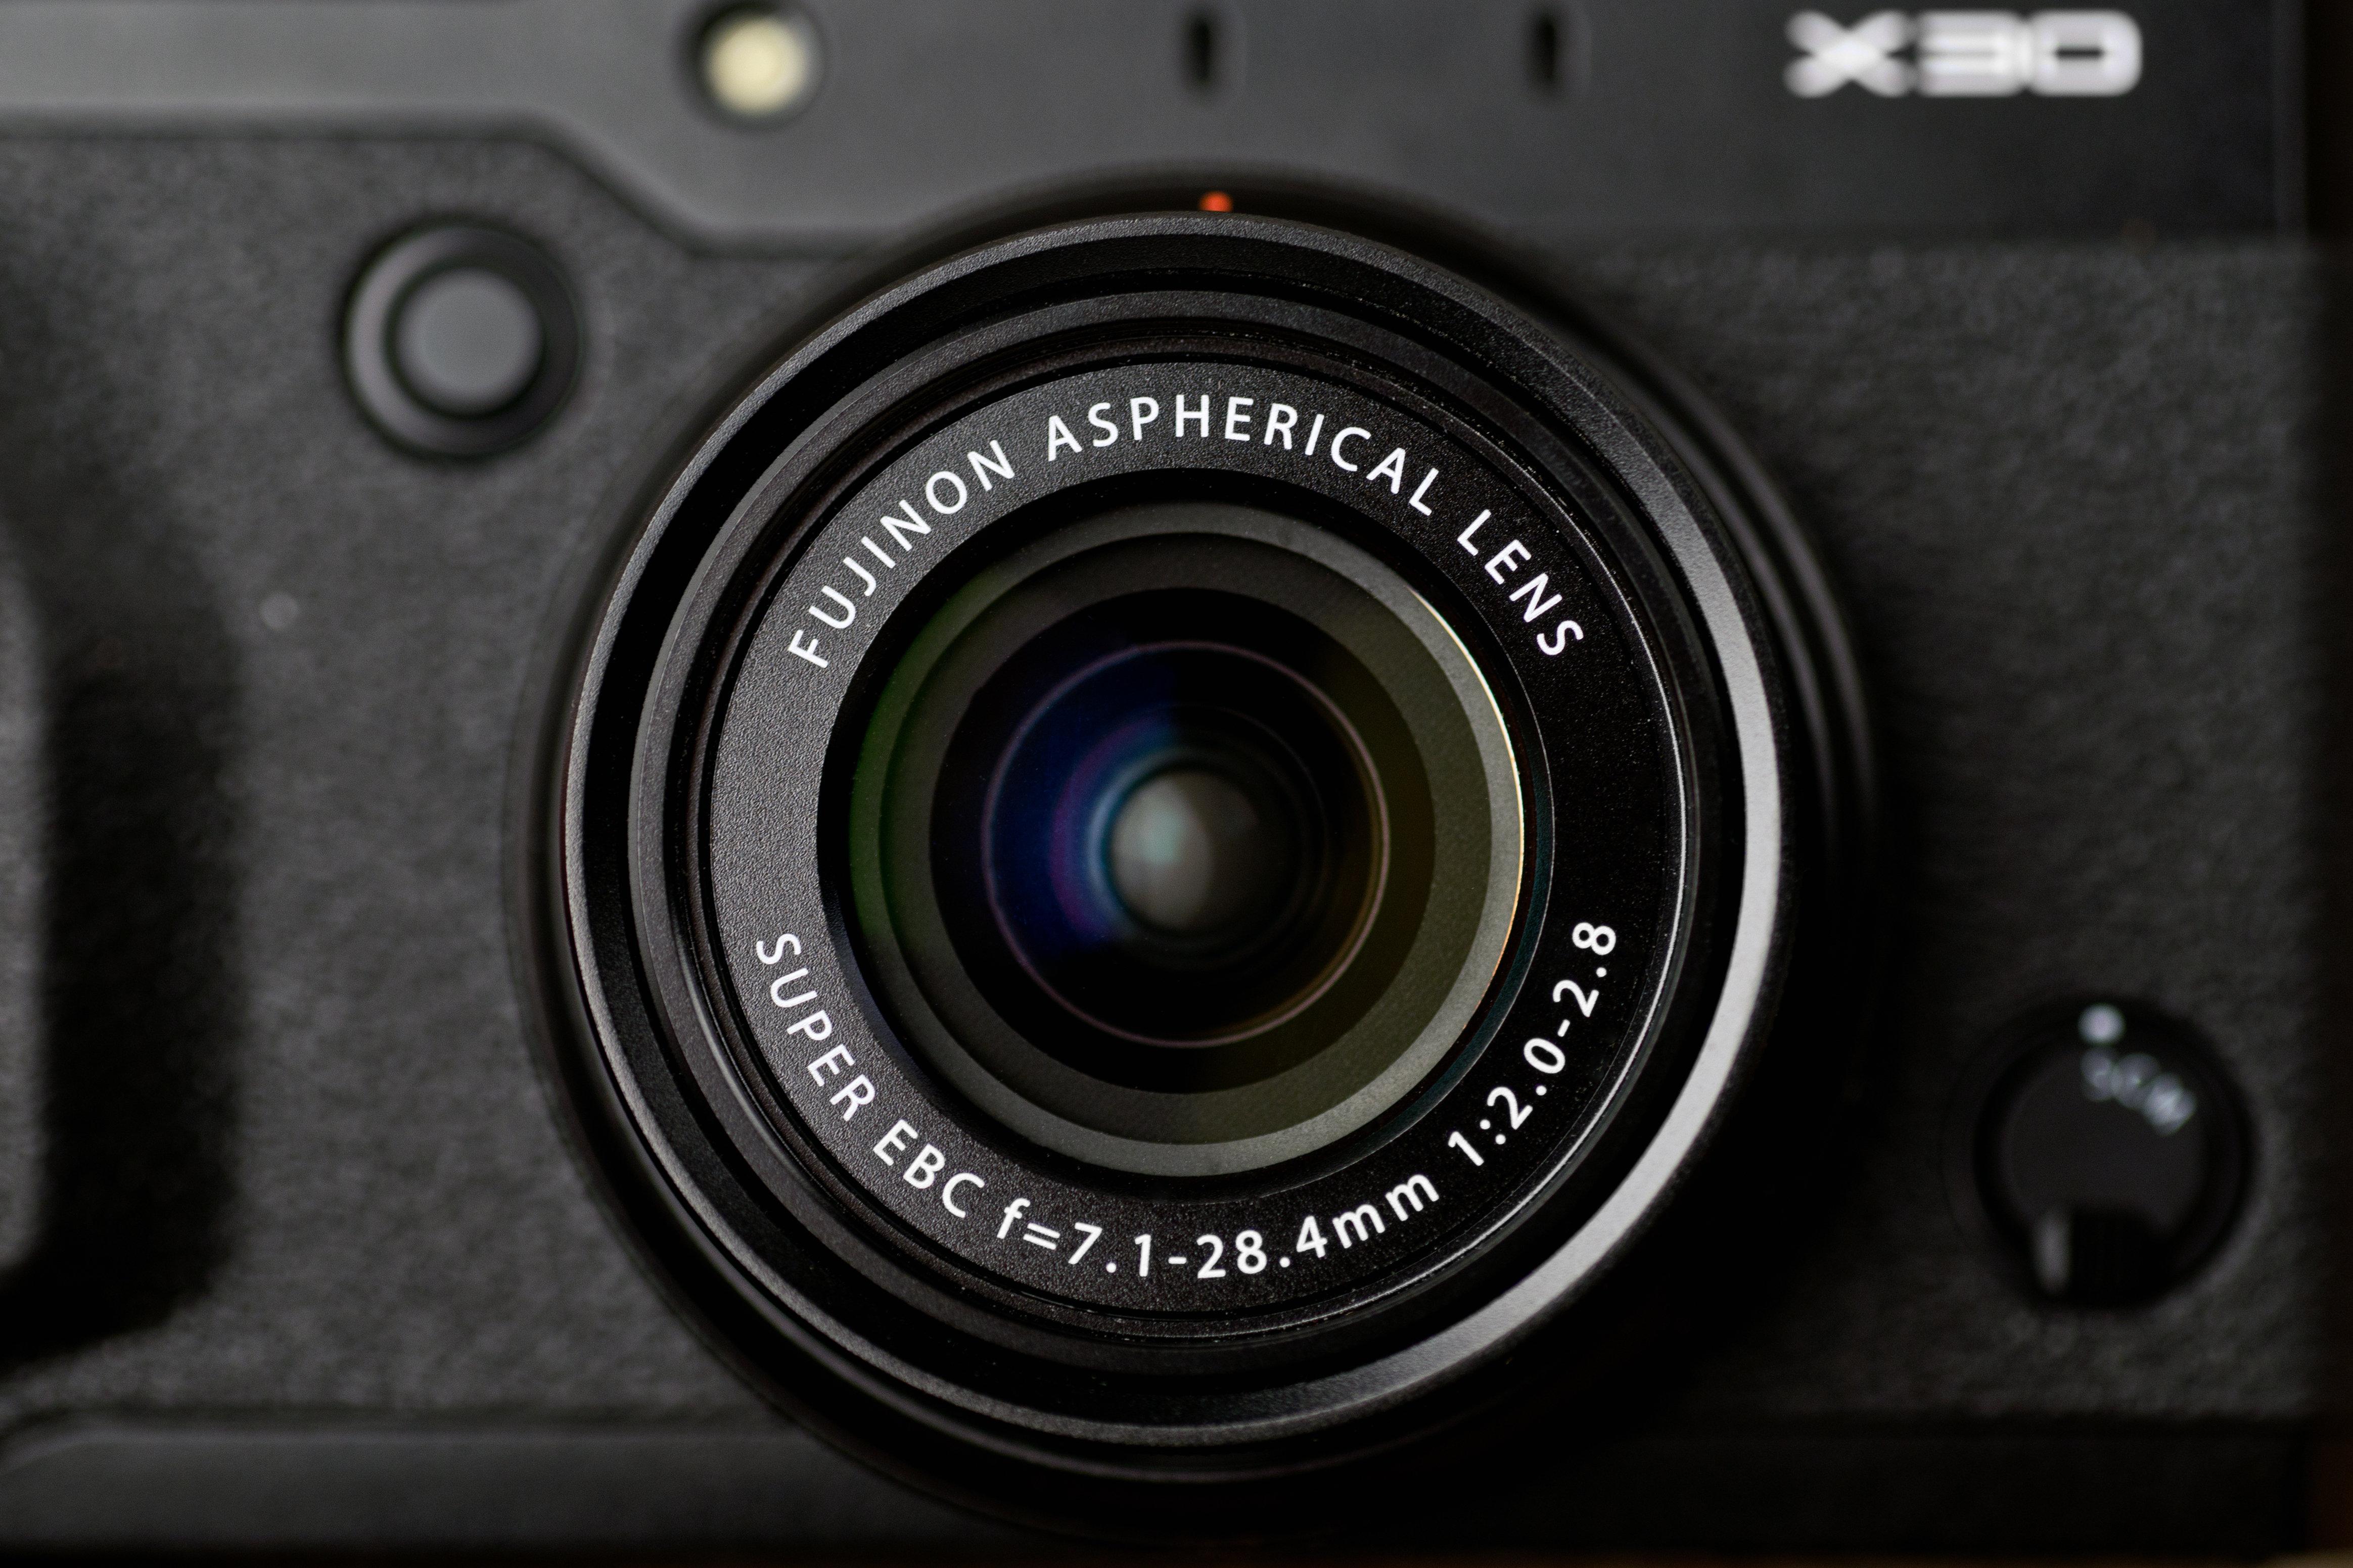 A photo of the Fujifilm X30's lens.